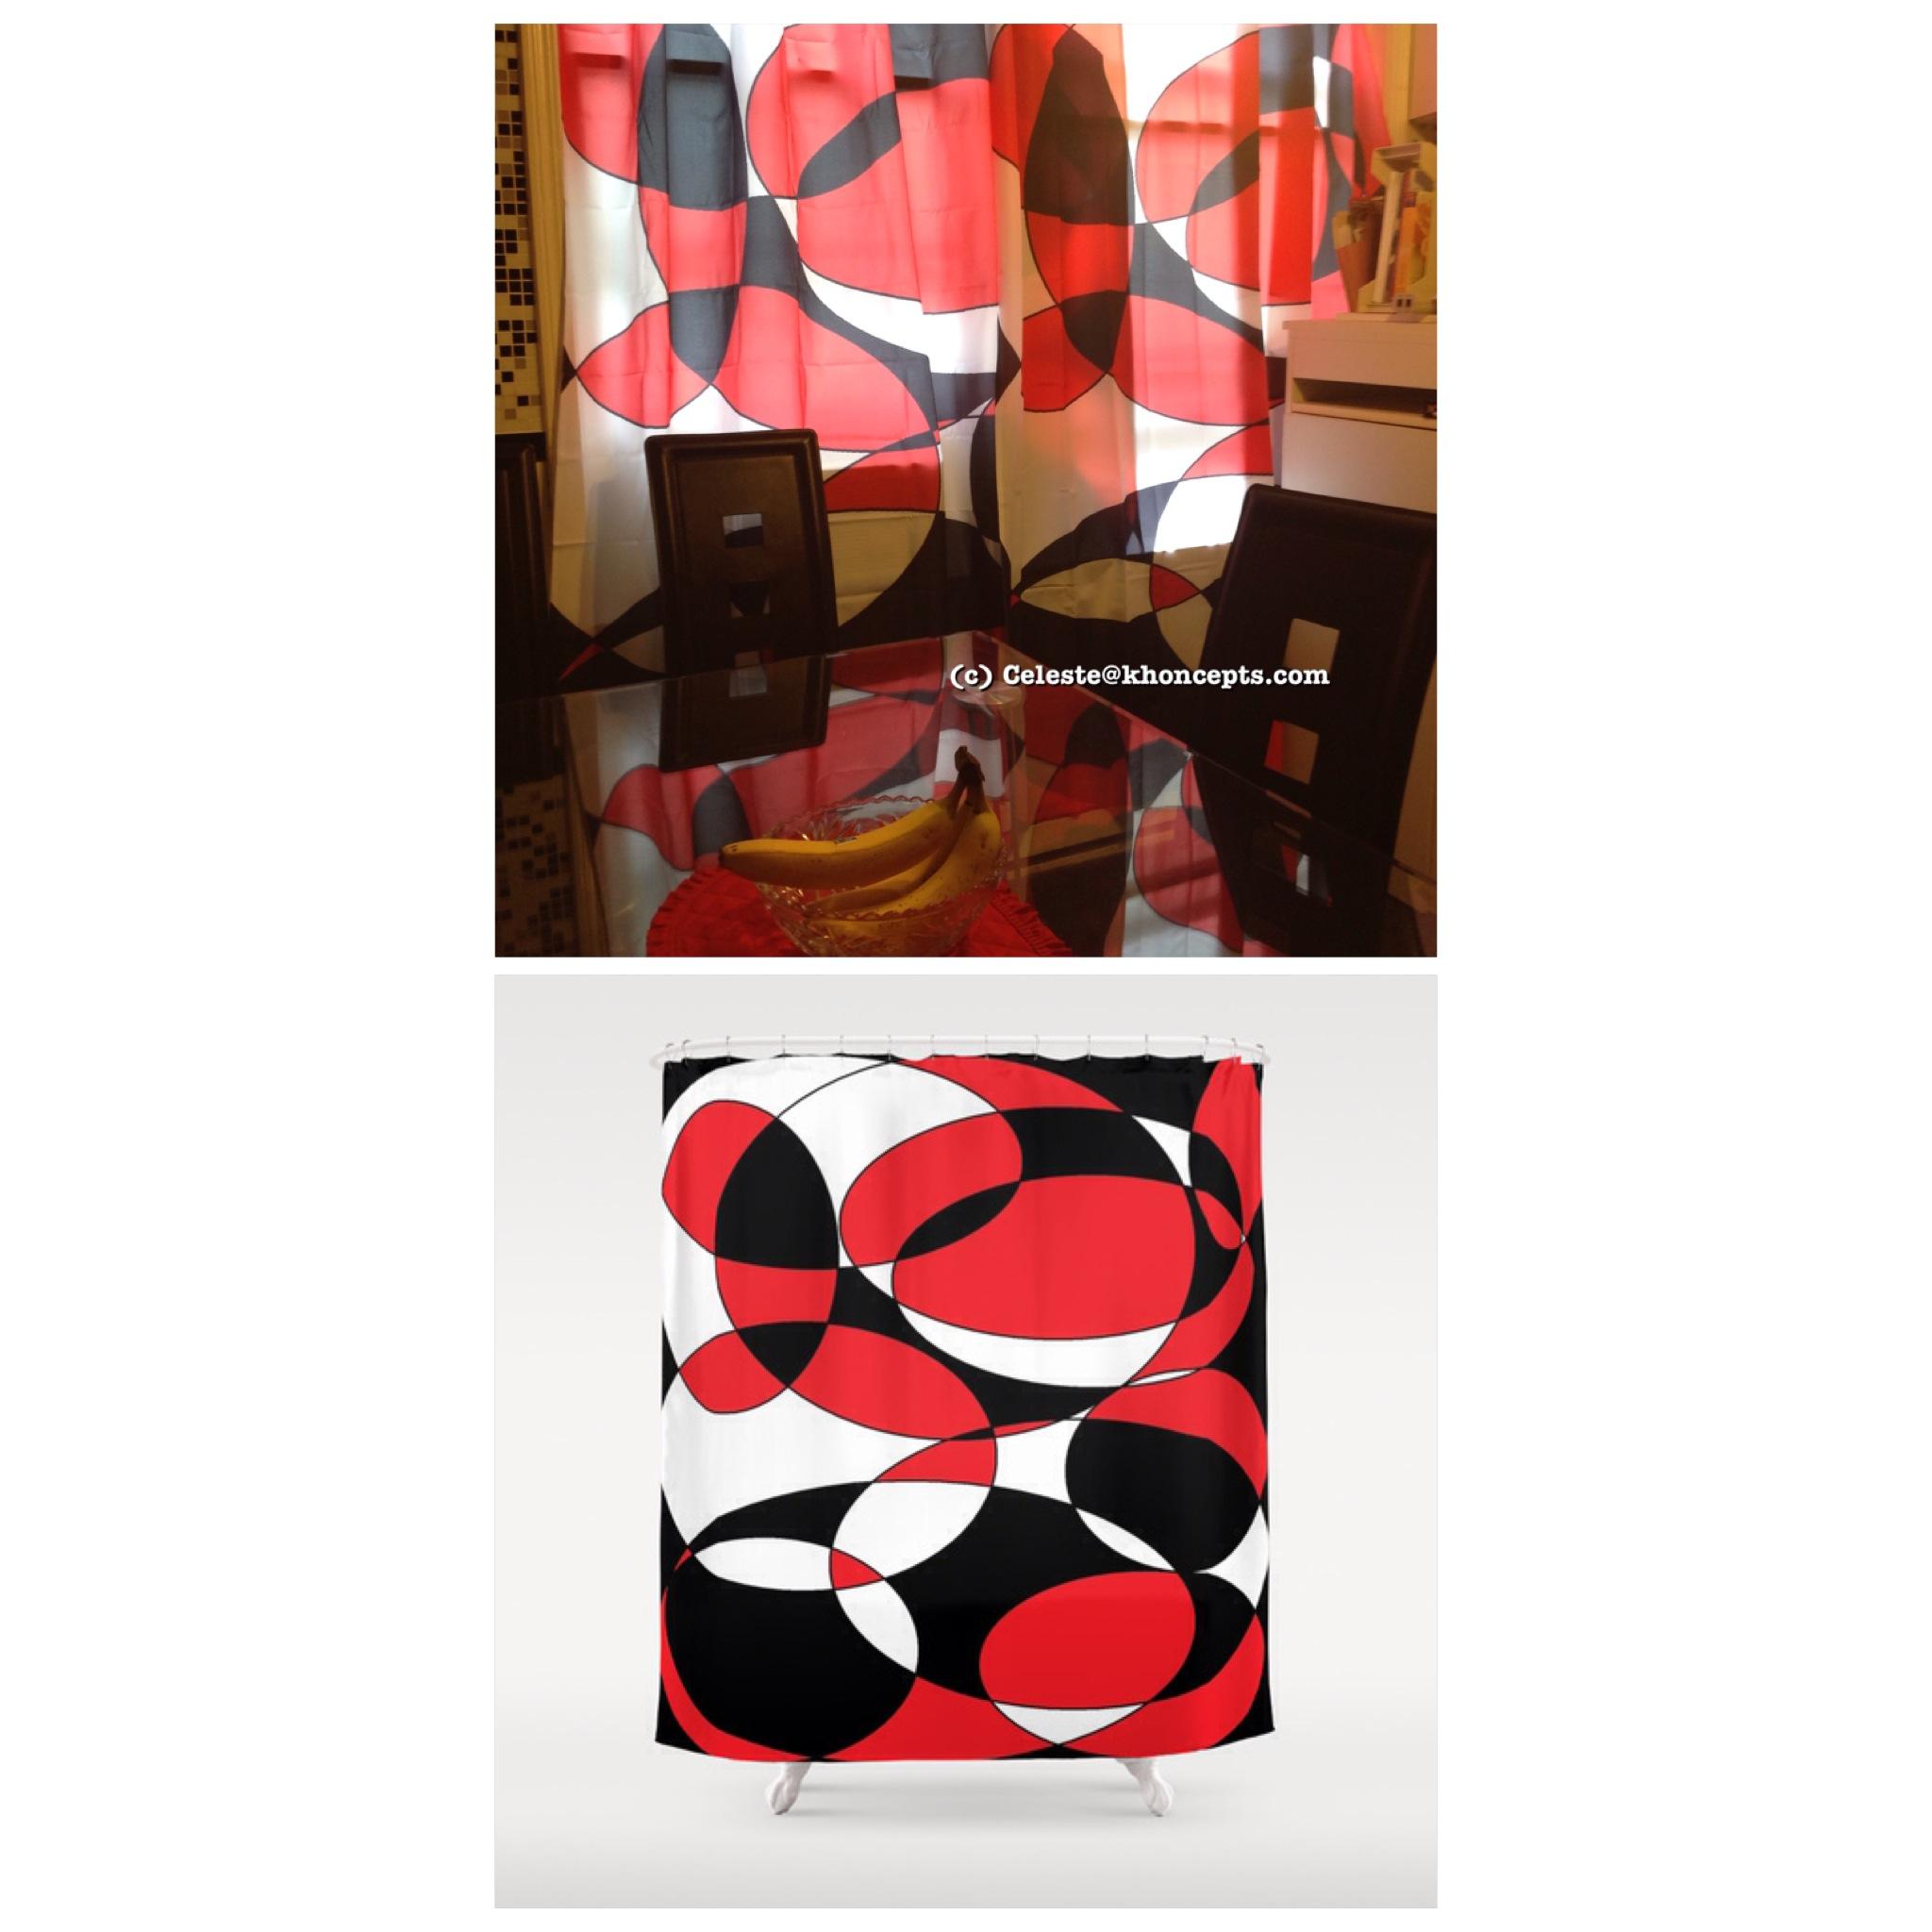 black white and red elliptical design